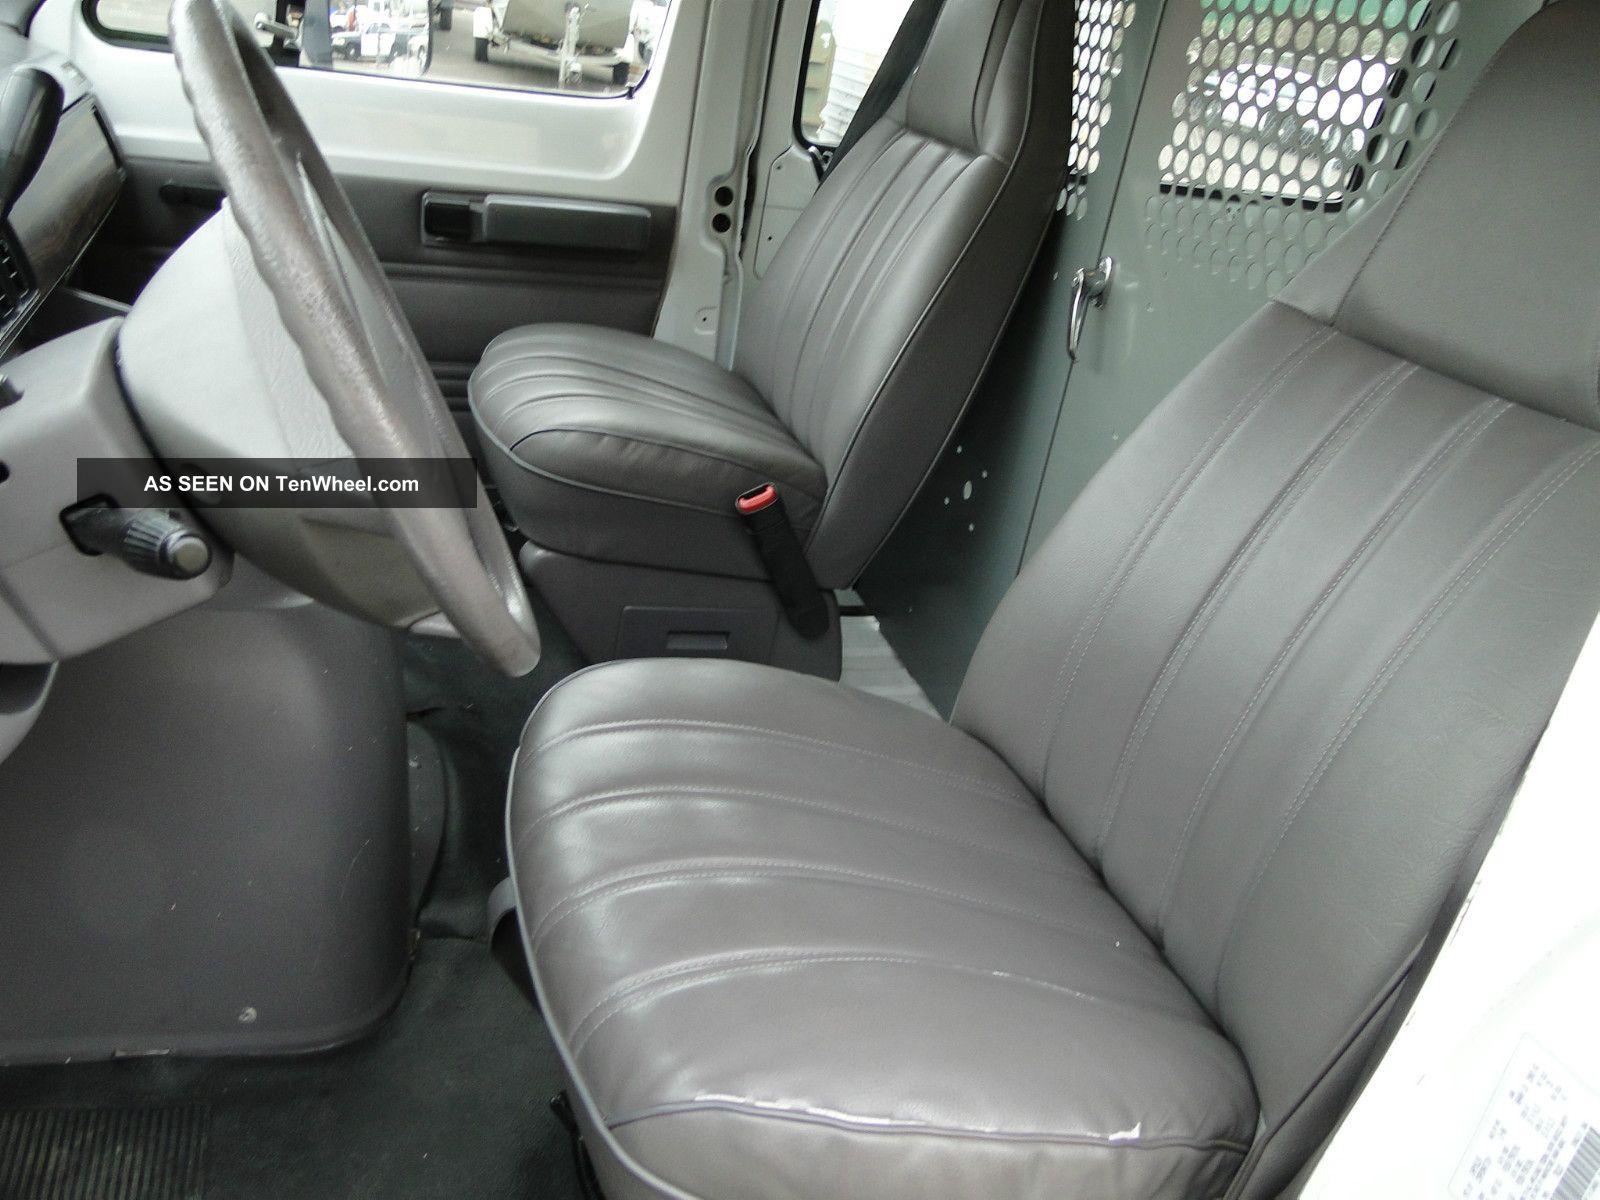 Dodge Ram Extended Cargo Van No Rear Seats Lgw on 2013 Dodge Ram 2500 4x4